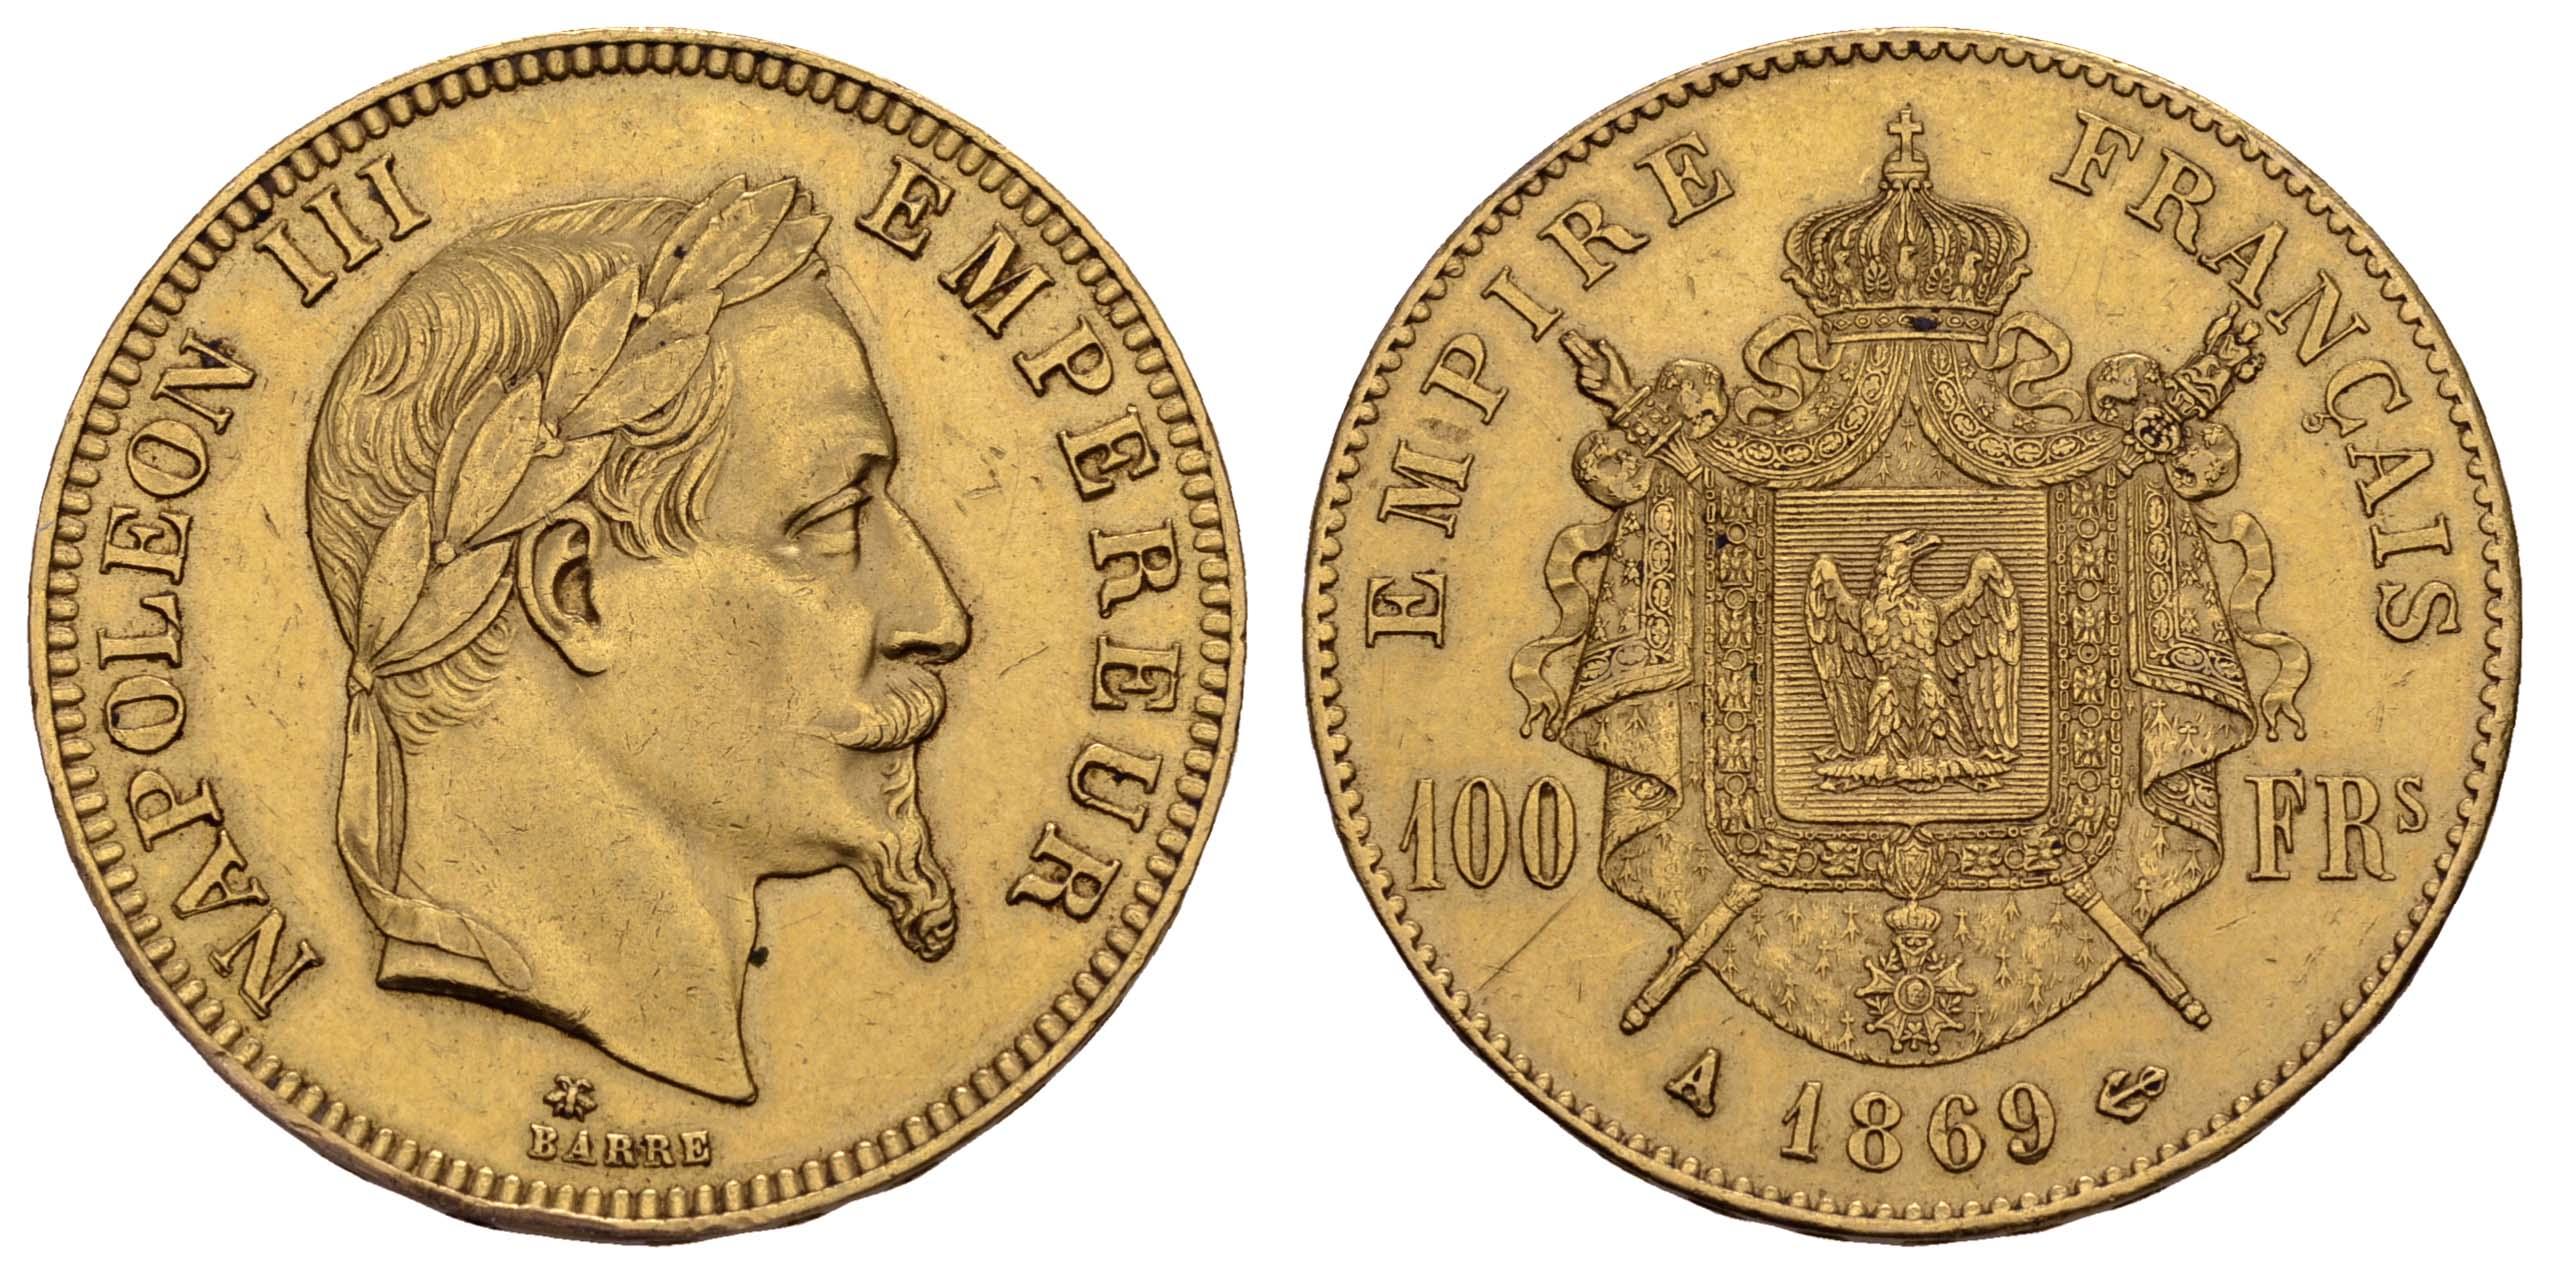 Lot 1525 - europa ab 1800 - Frankreich -  Auktionshaus Ulrich Felzmann GmbH & Co. KG Coins single lots